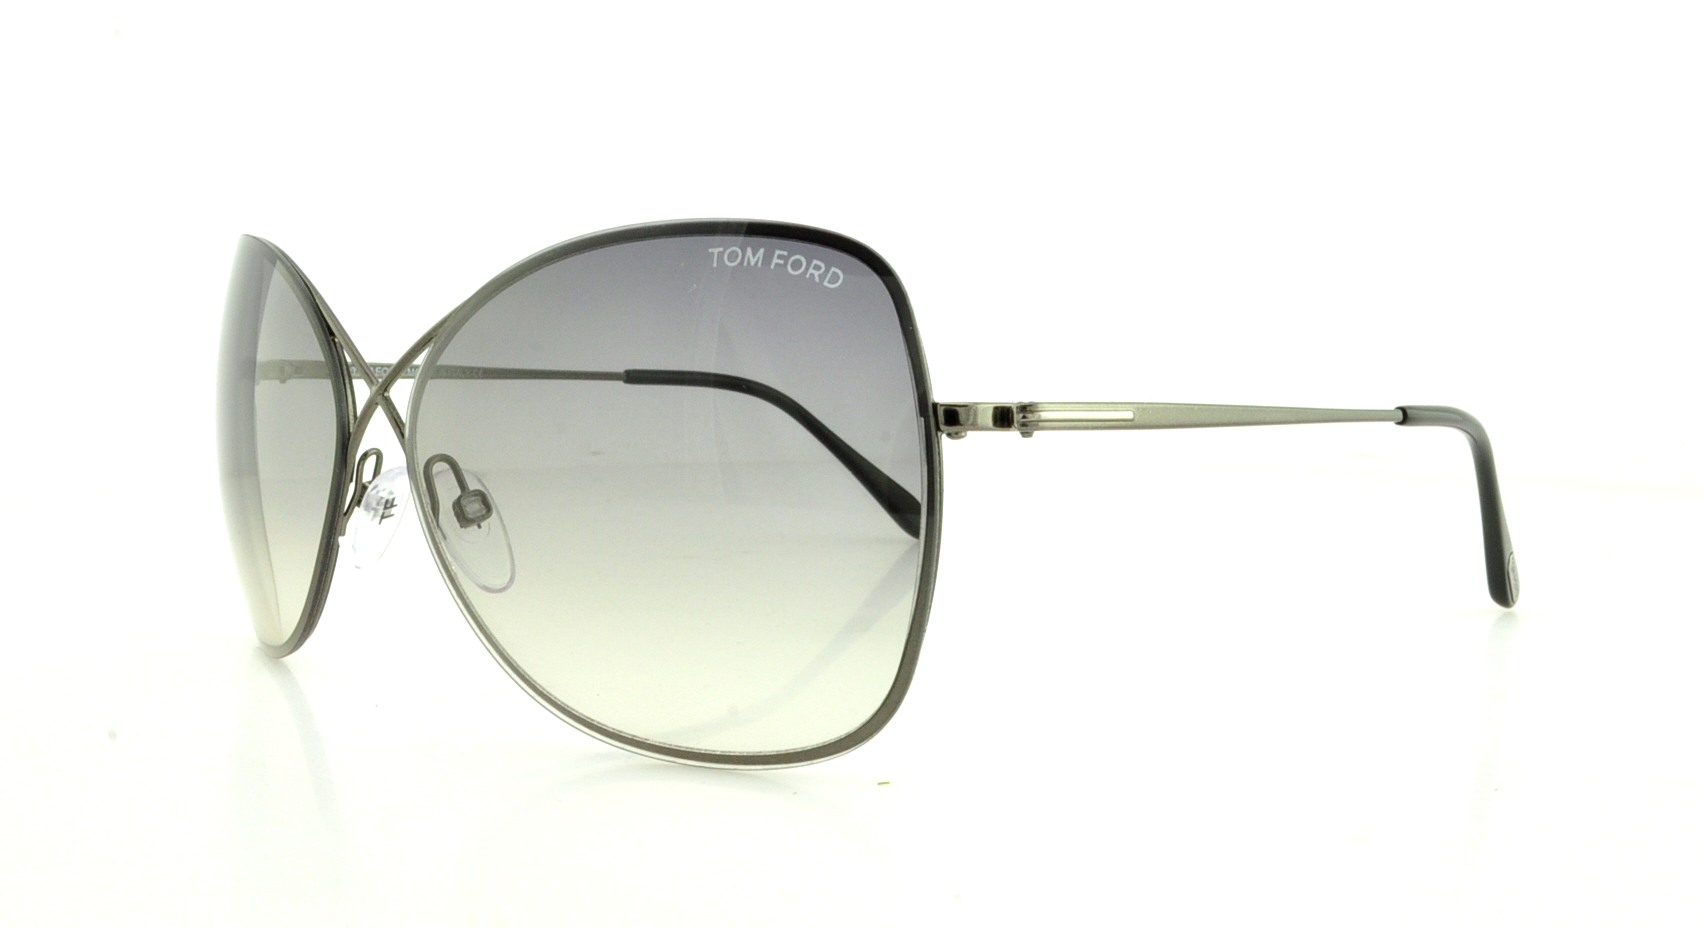 a03982d8d7815 TOM FORD Sunglasses FT0250 COLETTE 08C Shiny Gumetal 63MM ...